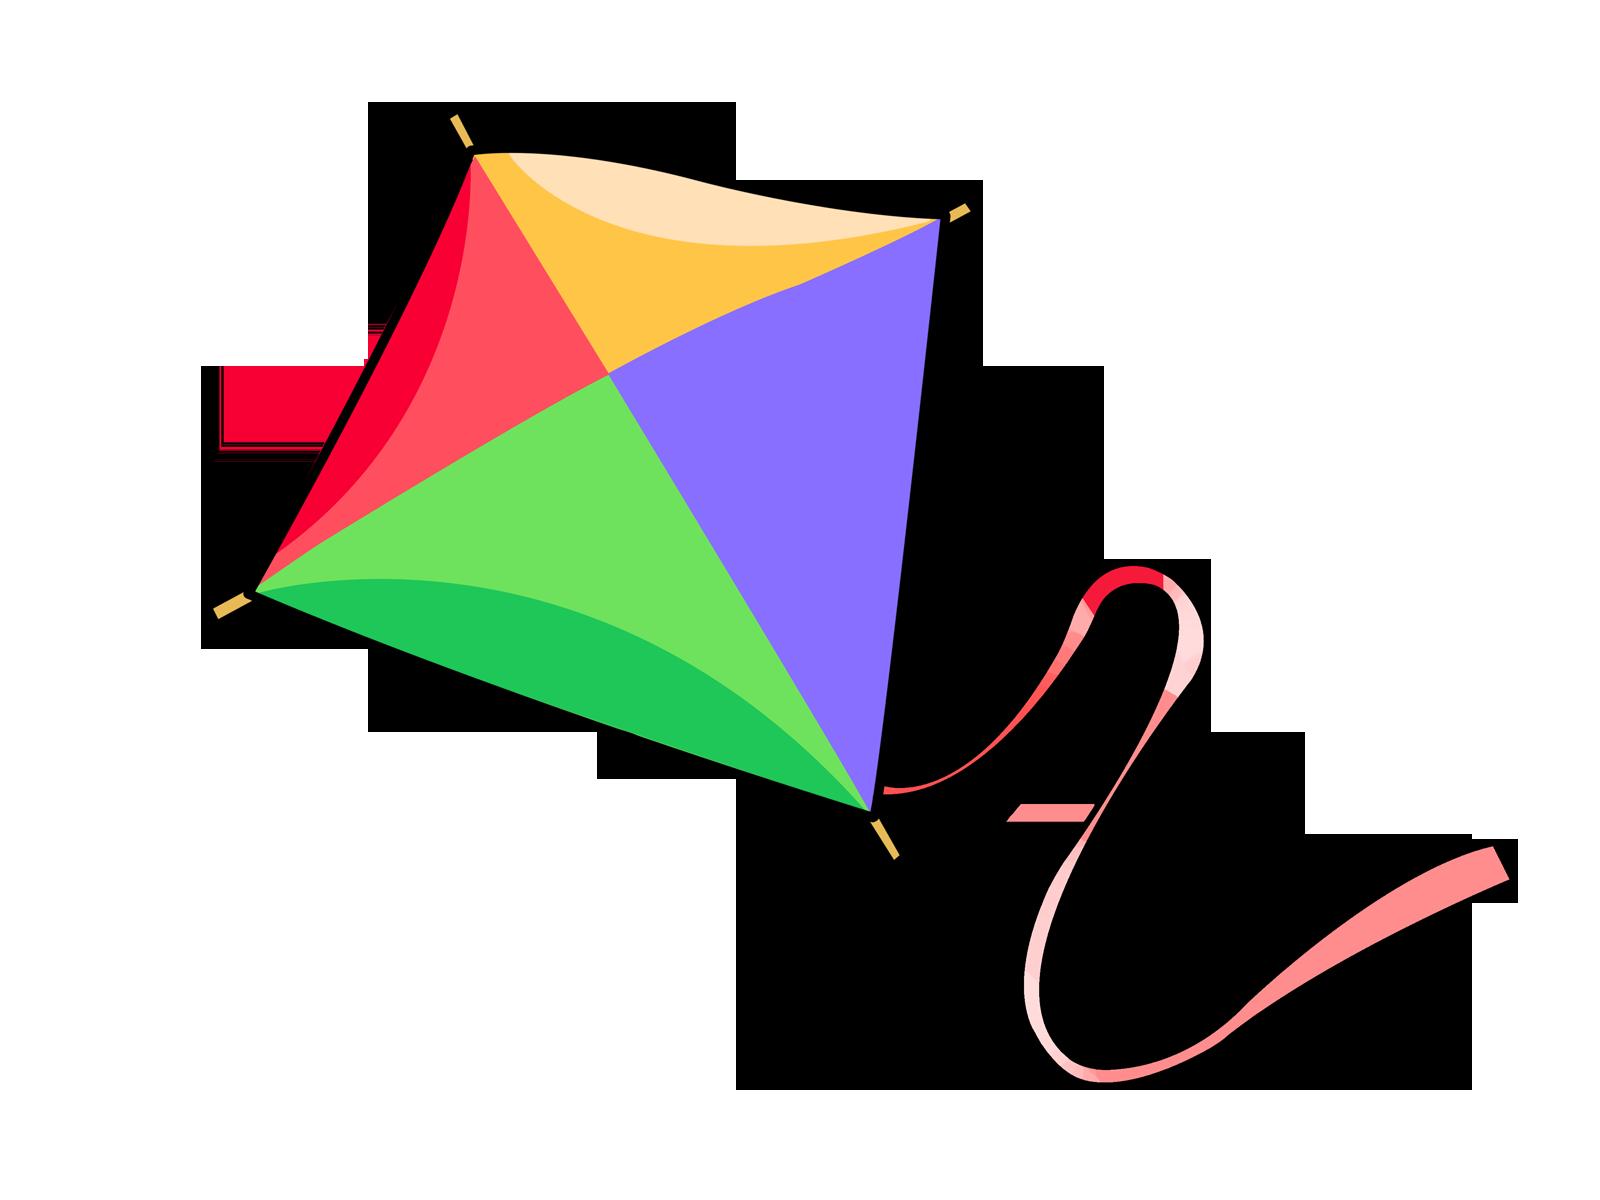 Kite #10